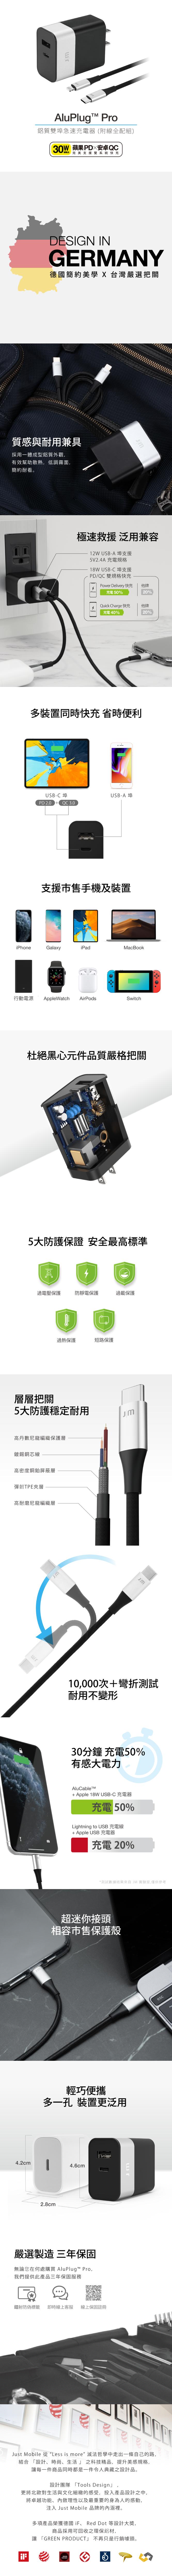 Just Mobile | AluPlug™ Pro 德國鋁質雙埠快充充電器 (附1.2m USB-C to Lightning 鋁質傳輸線)